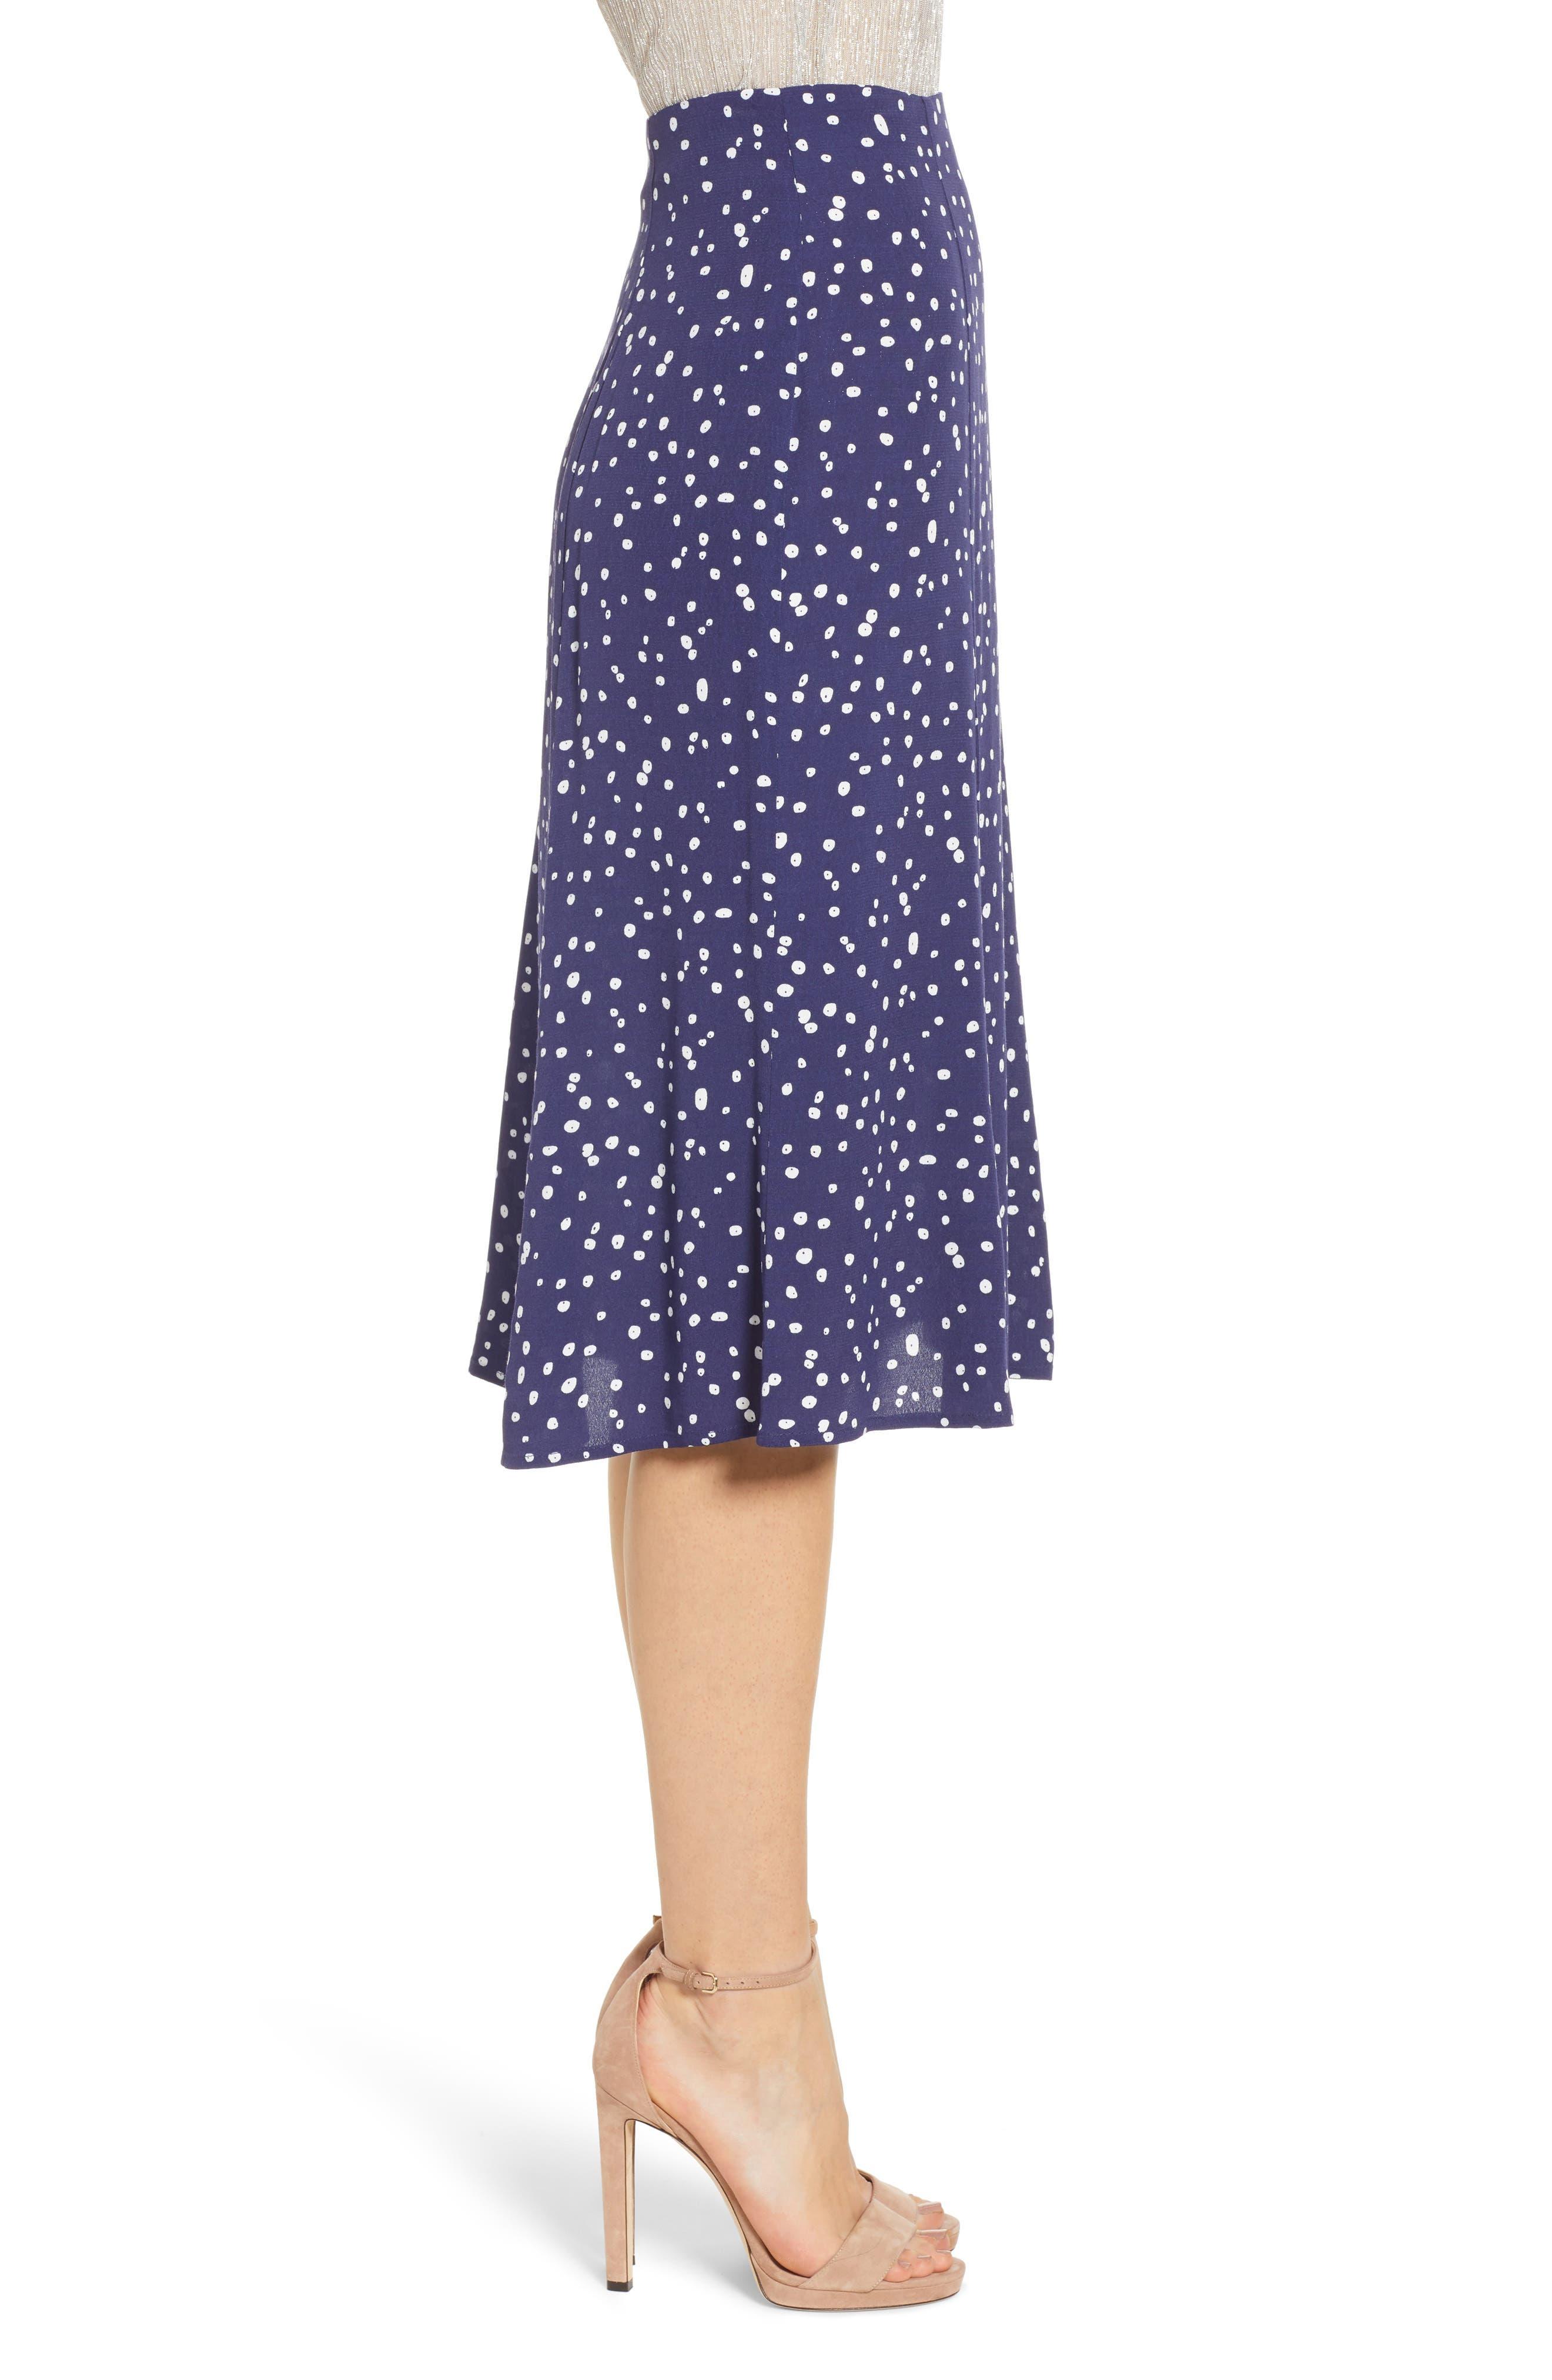 LEITH,                             High Waist Print Midi Skirt,                             Alternate thumbnail 3, color,                             NAVY PEACOAT BUTTON DOTS